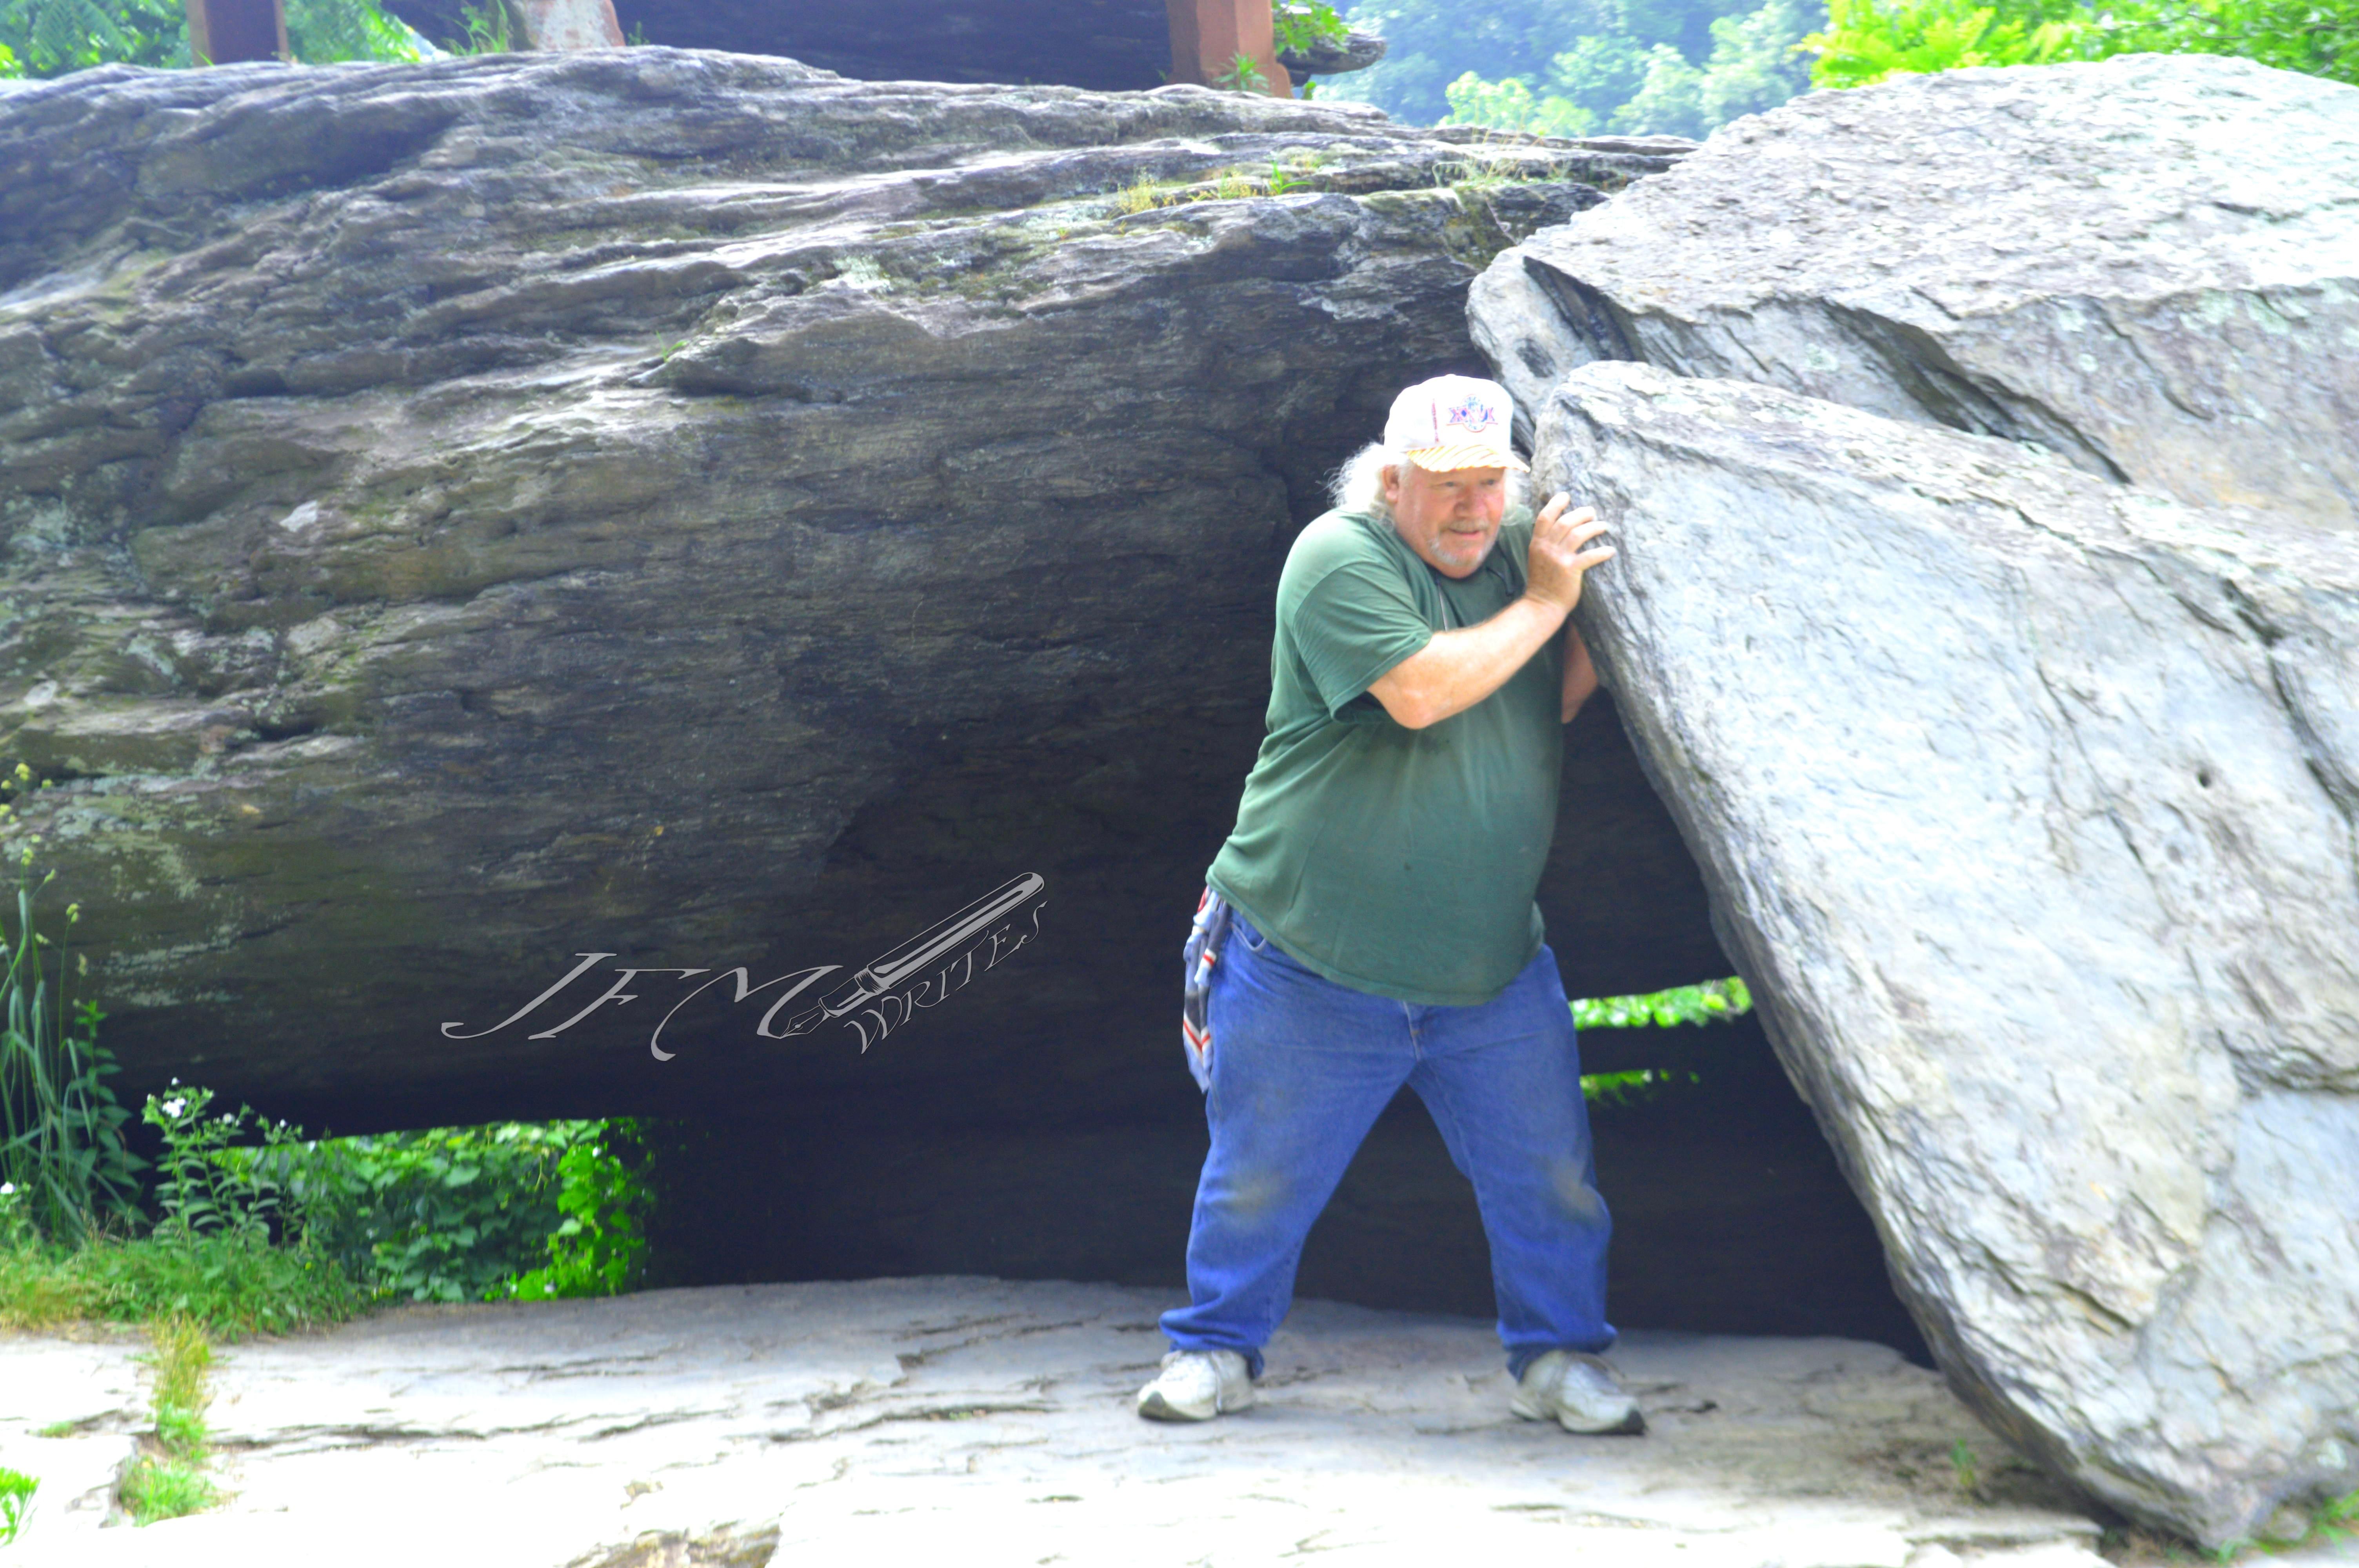 Jefferson Rock 2 CEWM